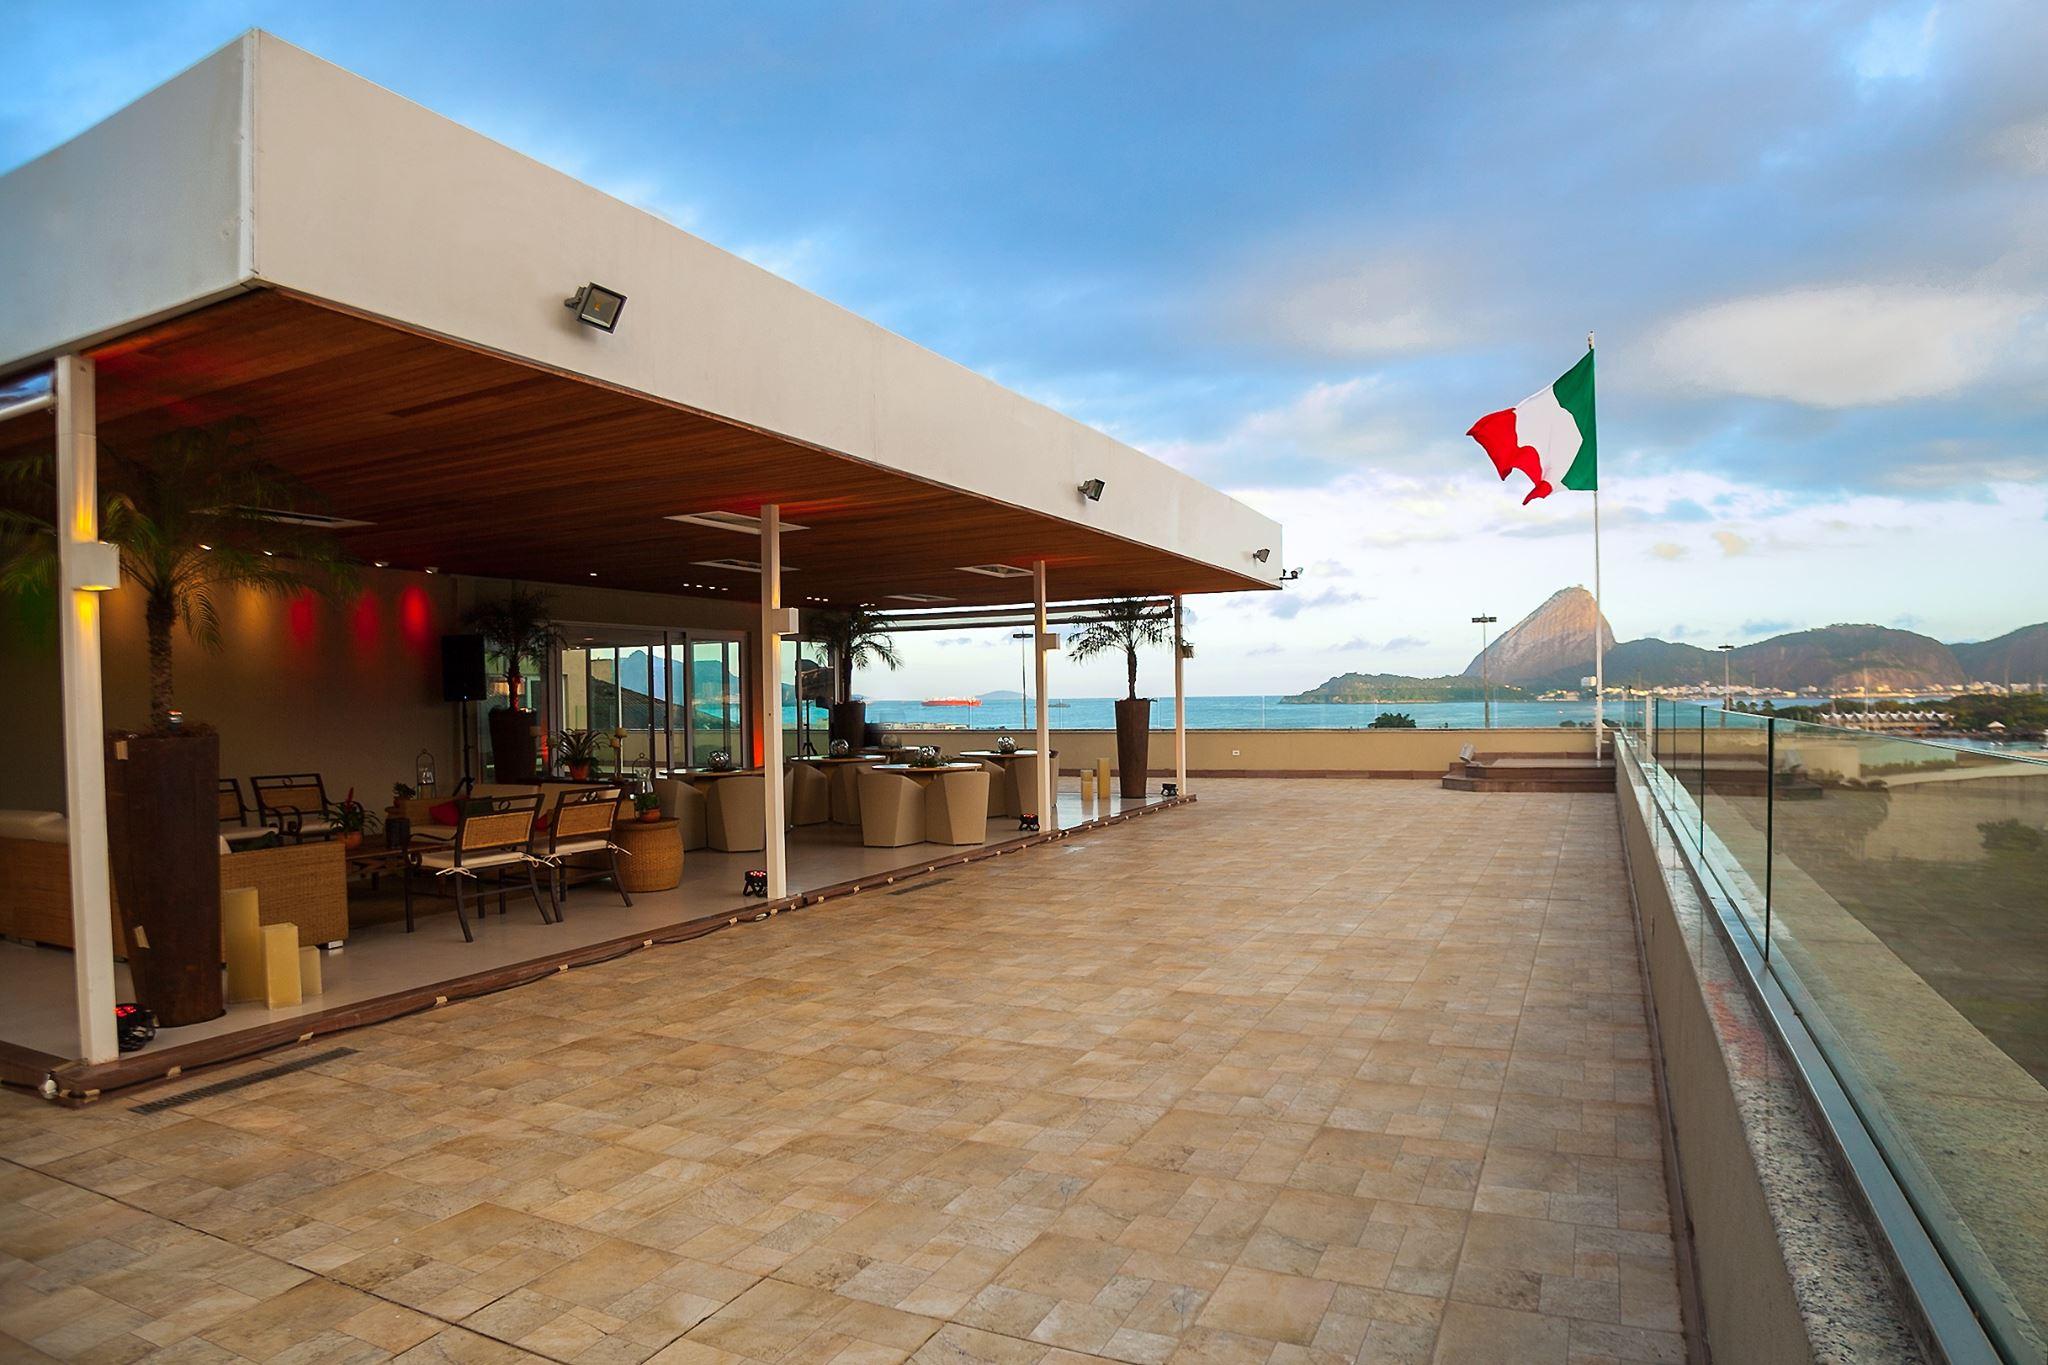 Italia Mia Evento De Gastronomia Italiana No Rio A Cara Do Rio